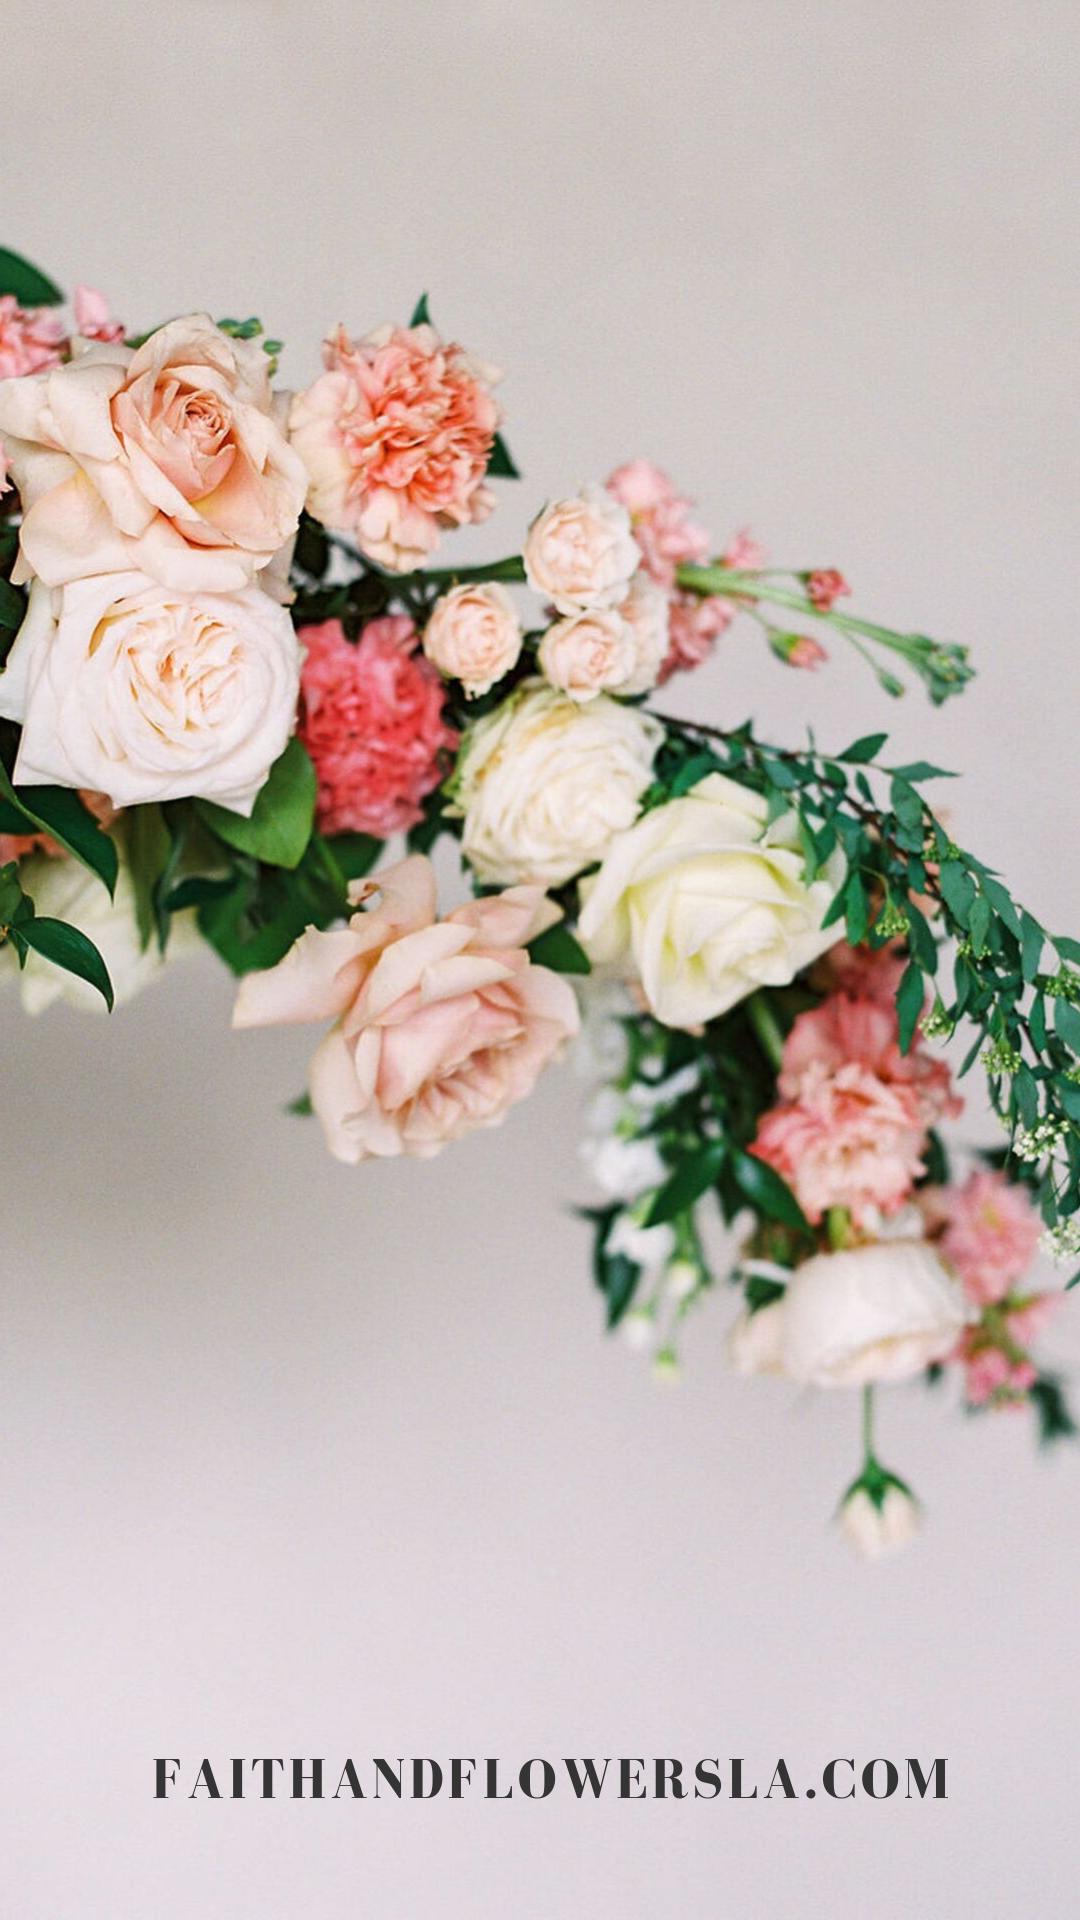 Faith And Flowers Lafayette Louisiana Wedding Florist Flower Centerpieces Wedding Summer Wedding Flowers Centerpieces Wedding Flower Decorations